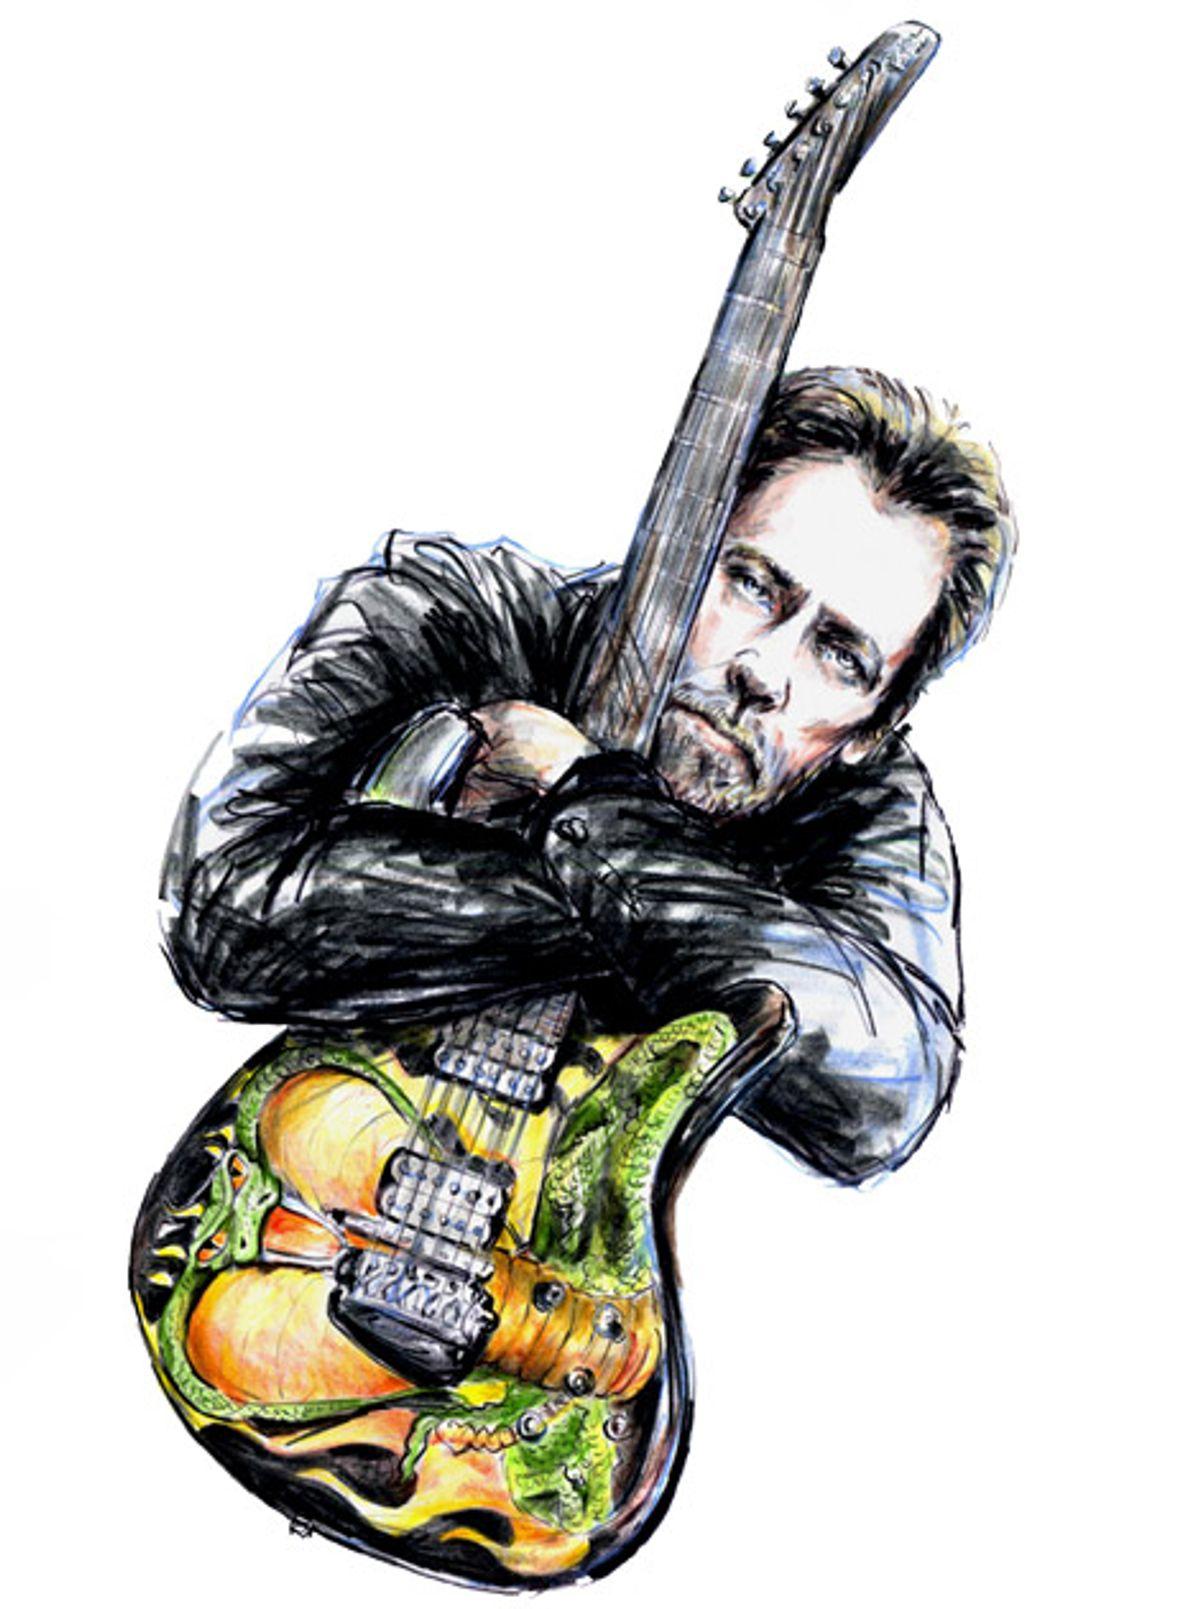 Psych-Blues Guitar Hero Harvey Mandel